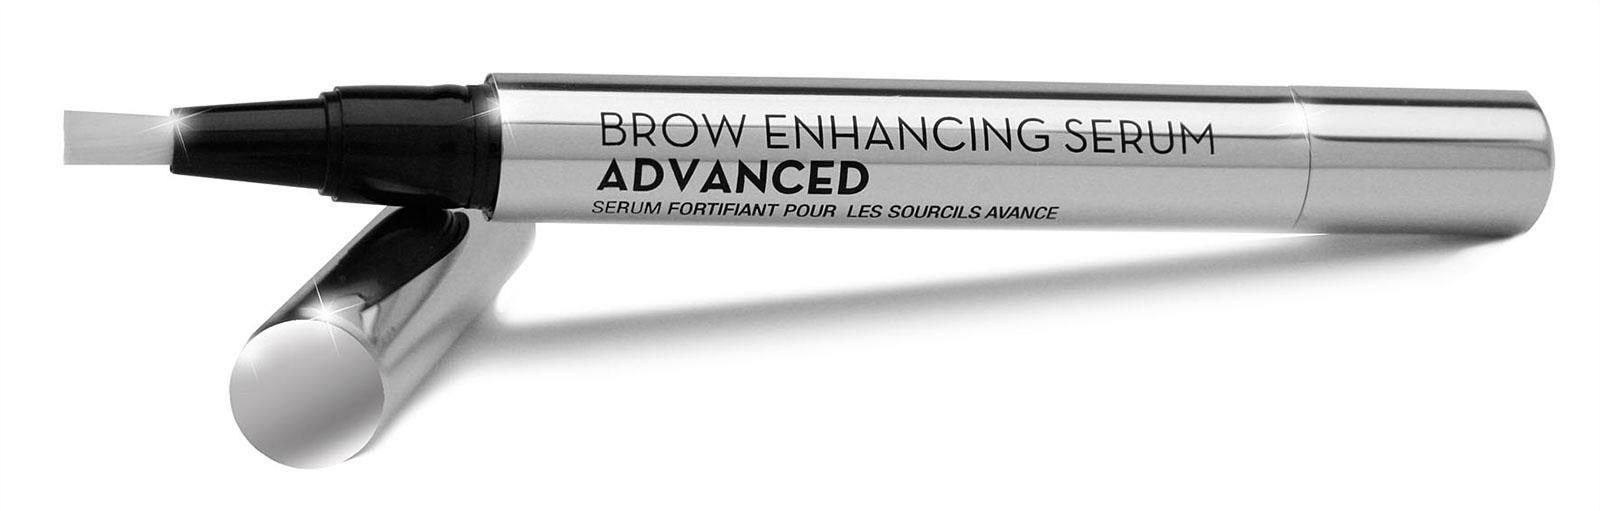 Brow Enhhancing Serum Advanced